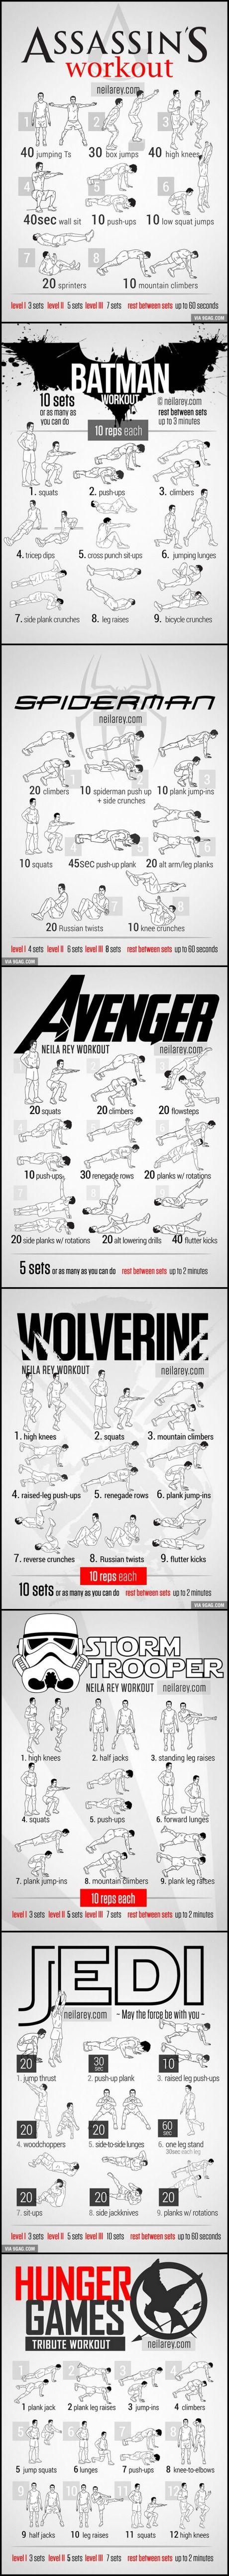 Workout for Assassin, Batman, Spiderman, Avenger, Wolverine...